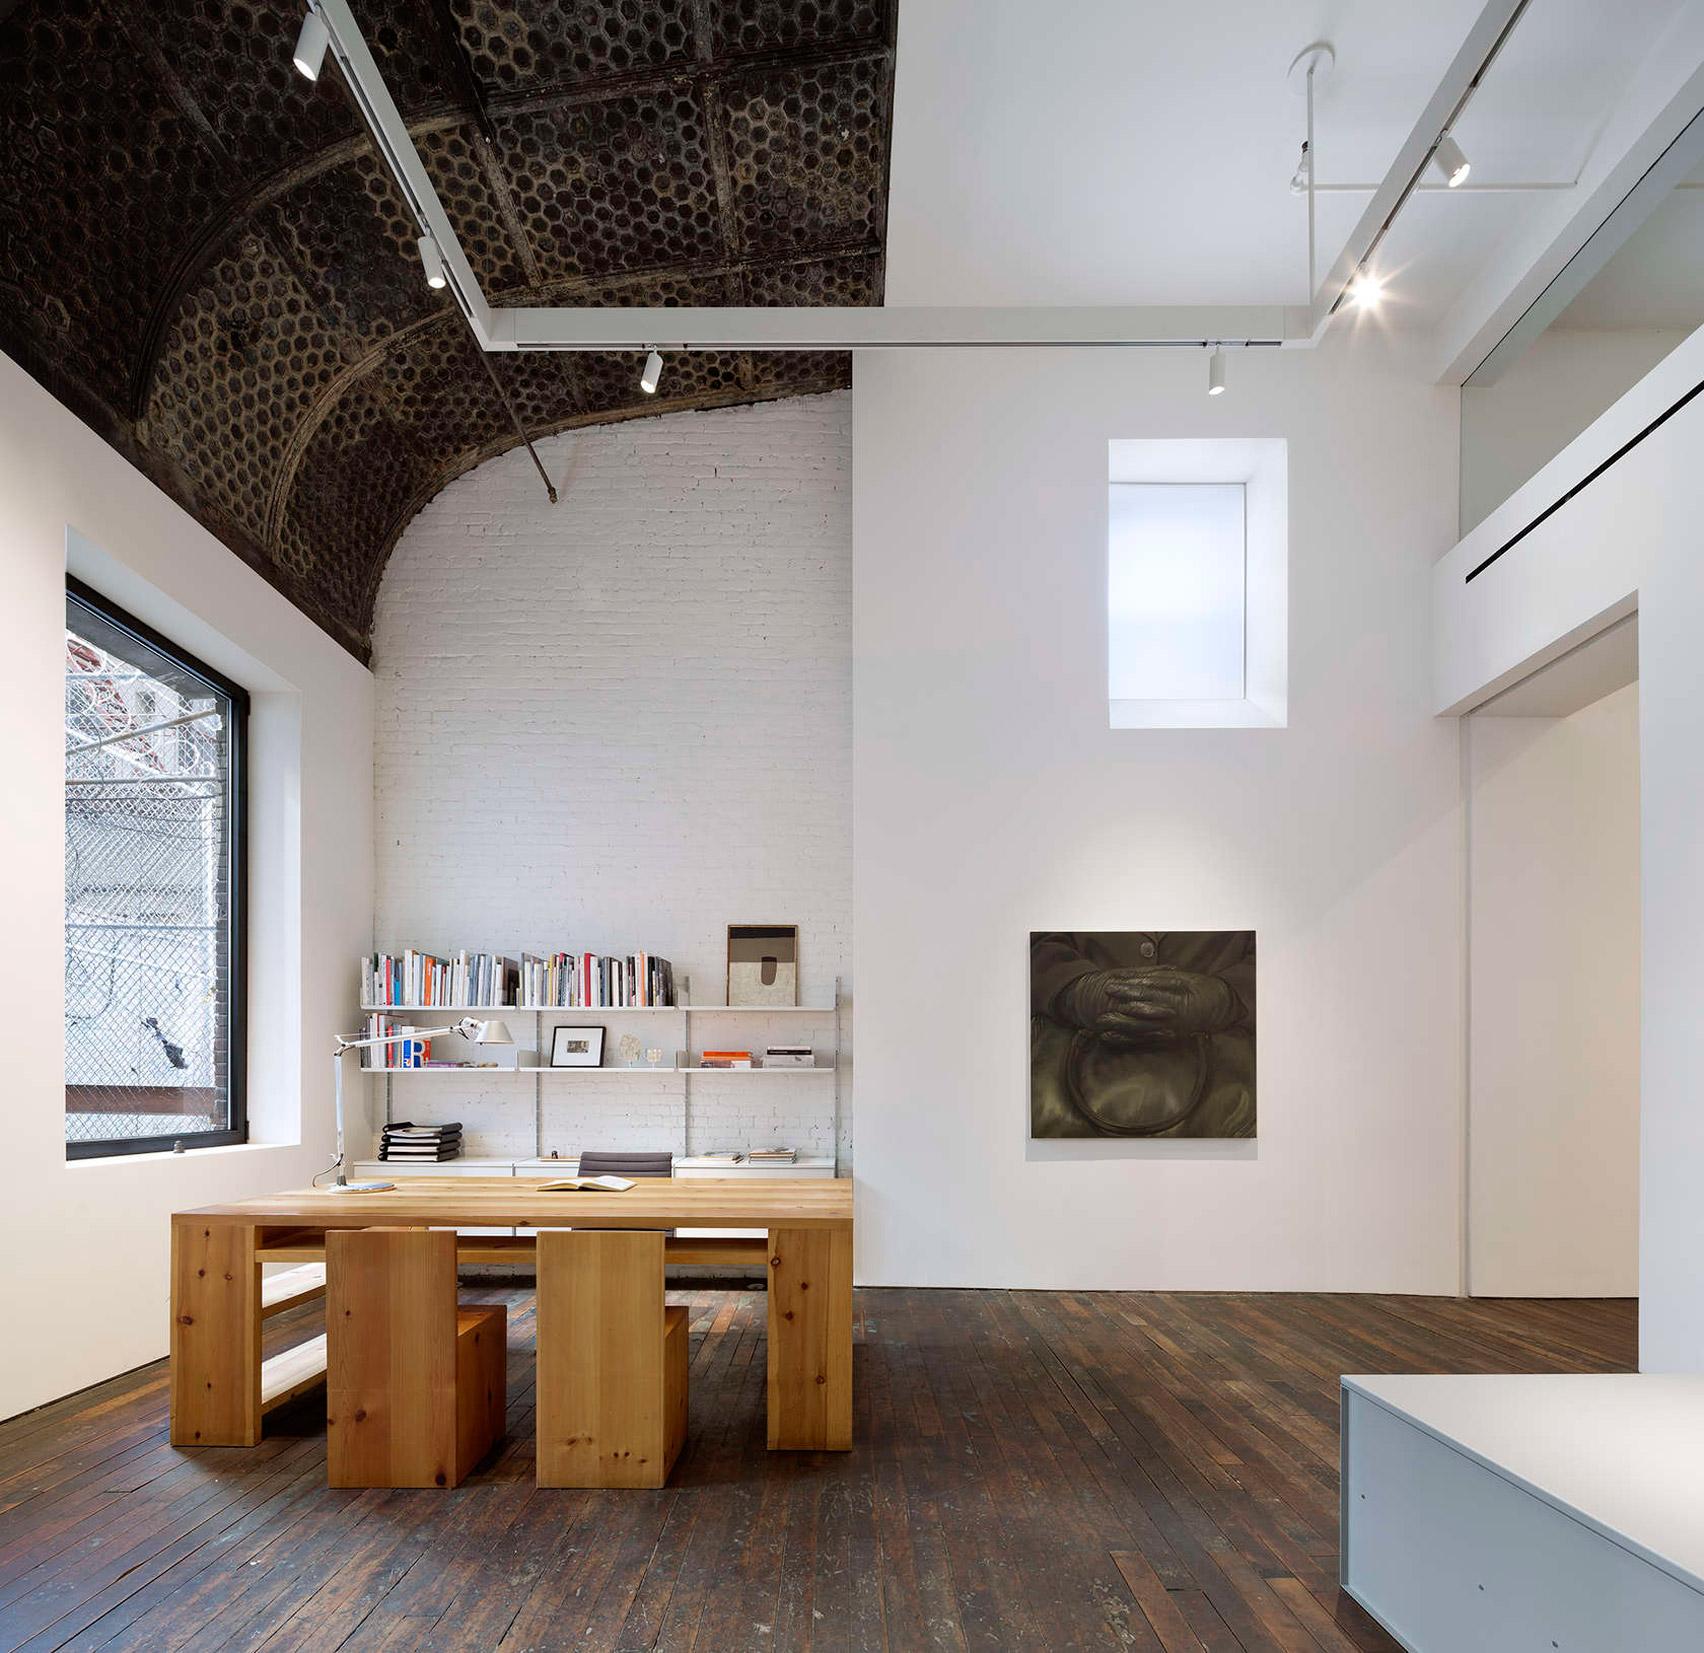 Toshiko Mori and Hirsch Corti turn label-making factory into Peter Freeman Gallery